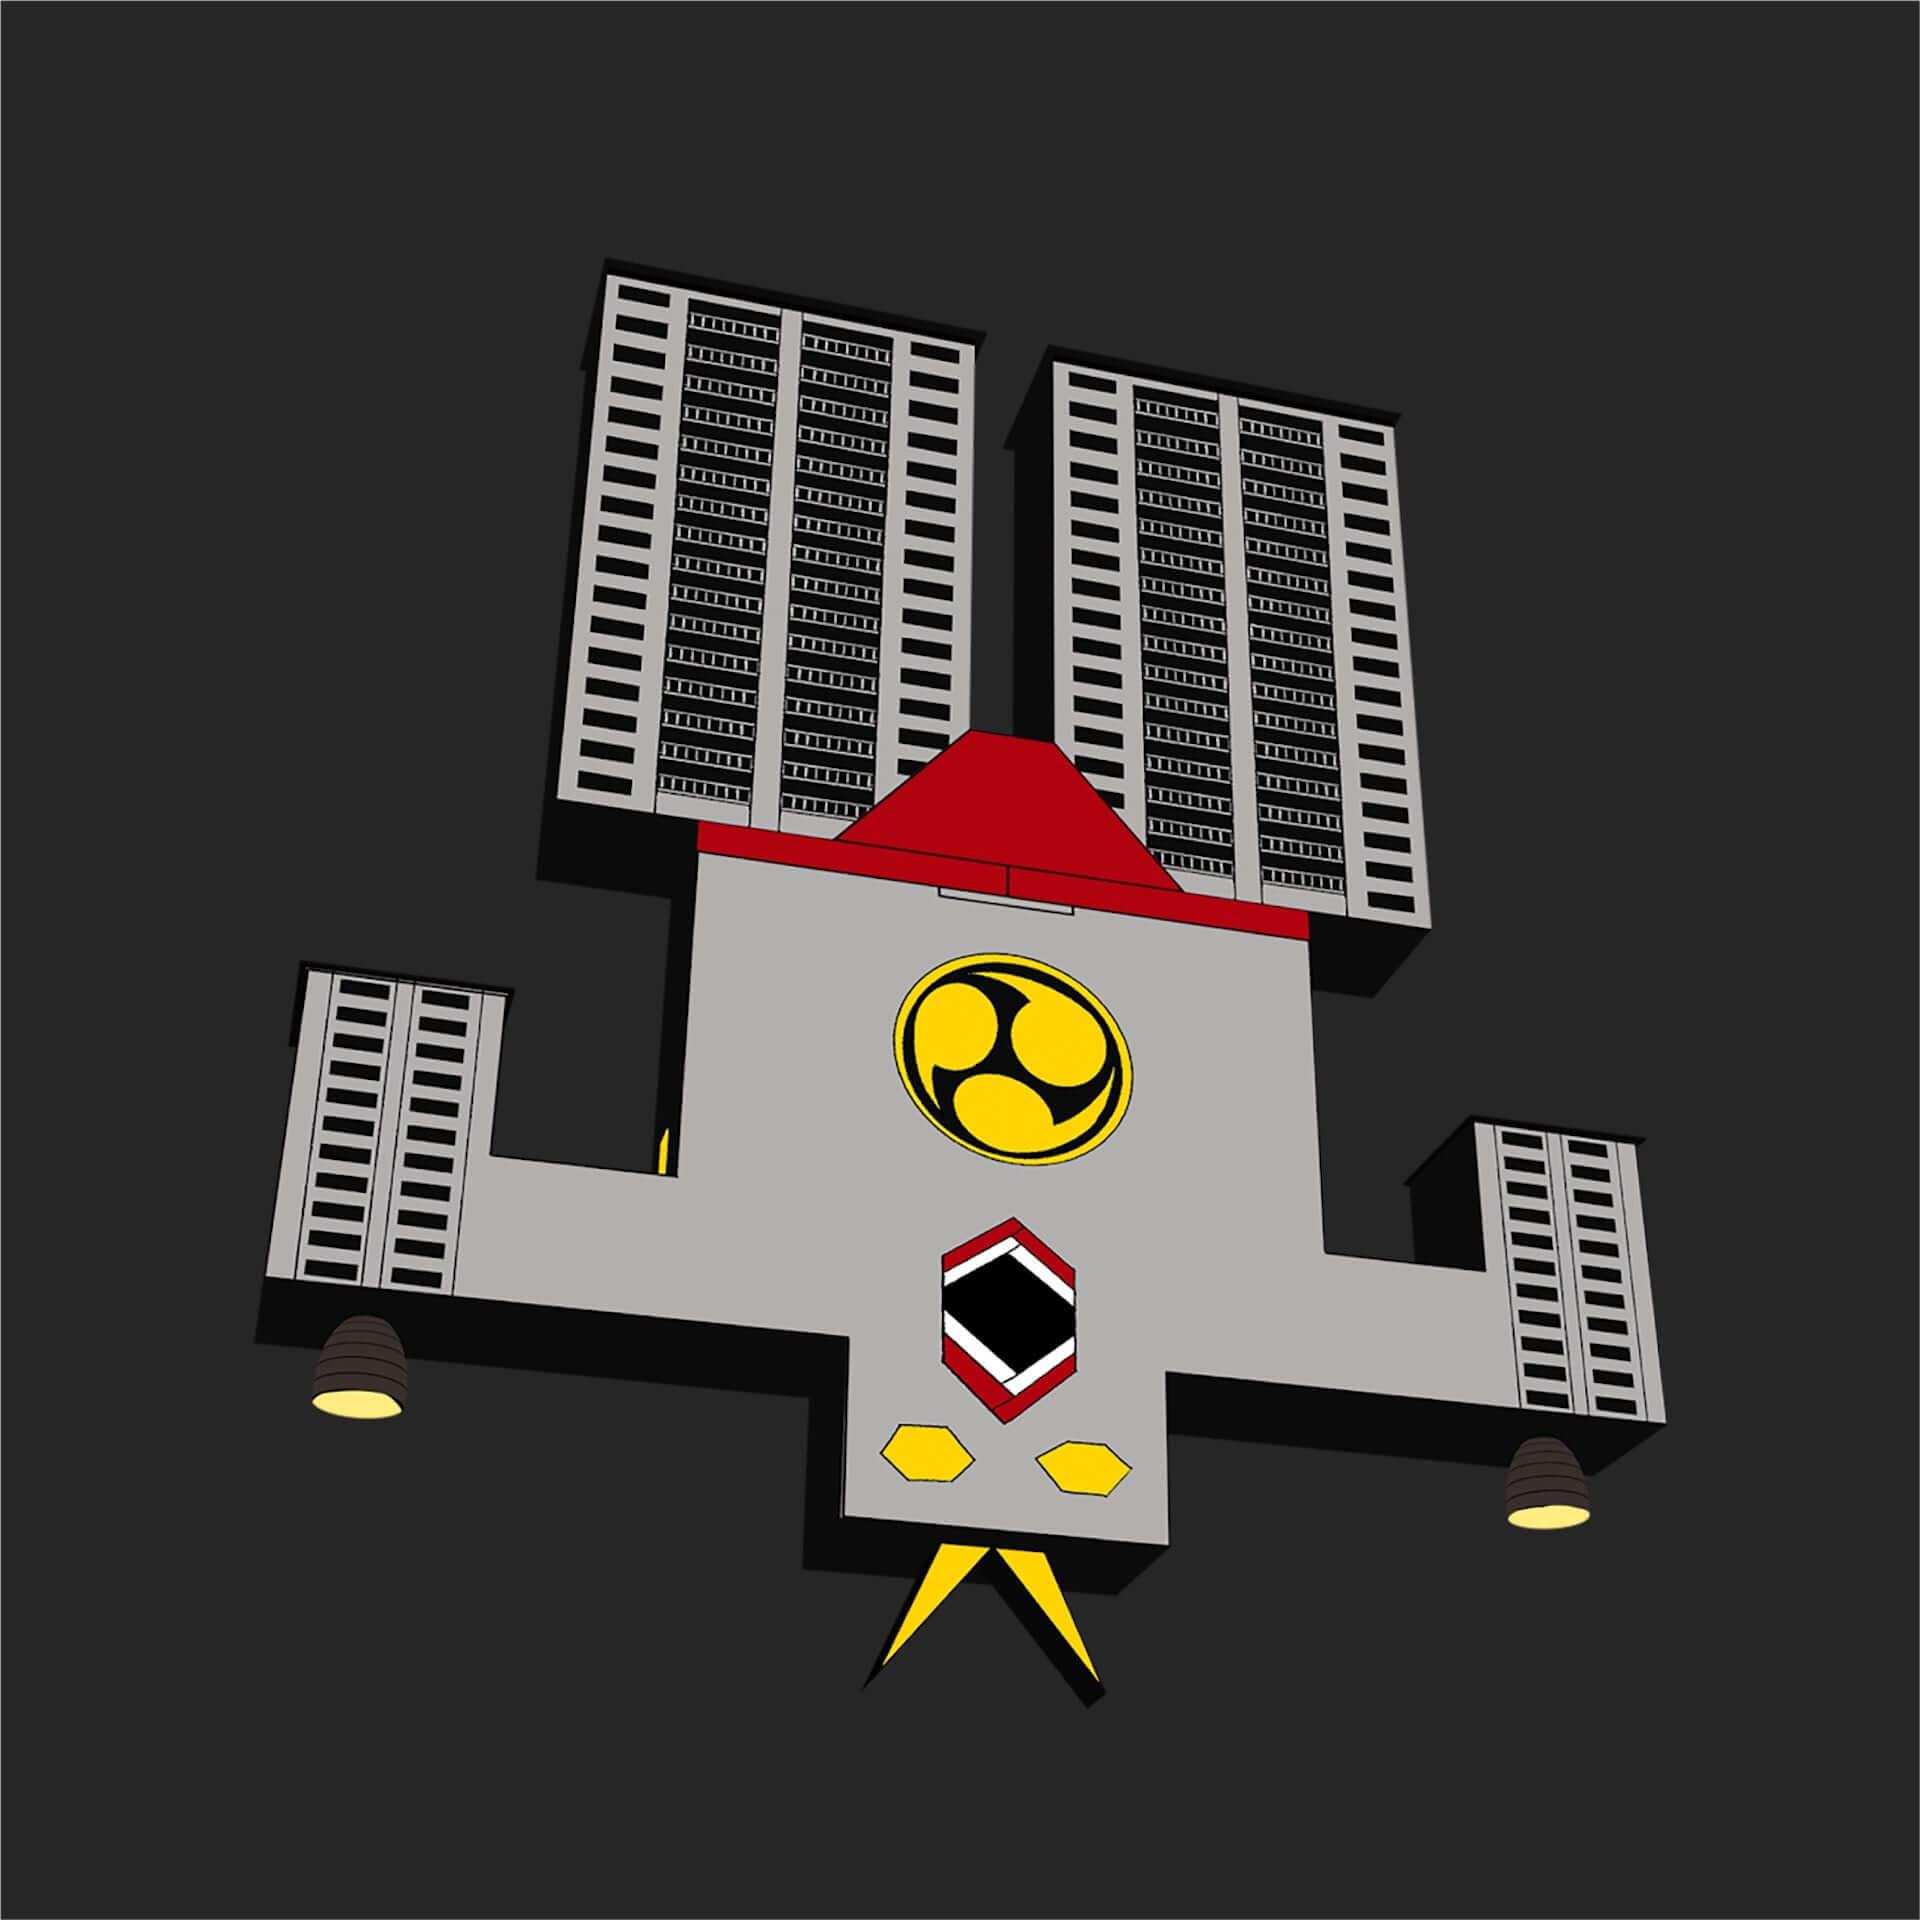 "AC部初の大規模個展<九越 -Transmorph->が日本橋三越本店で開催決定!Battles""Sugar Foot""『大宇宙ロボット祭』の最新作など展開 art201218_ac-bu_3-1920x1920"